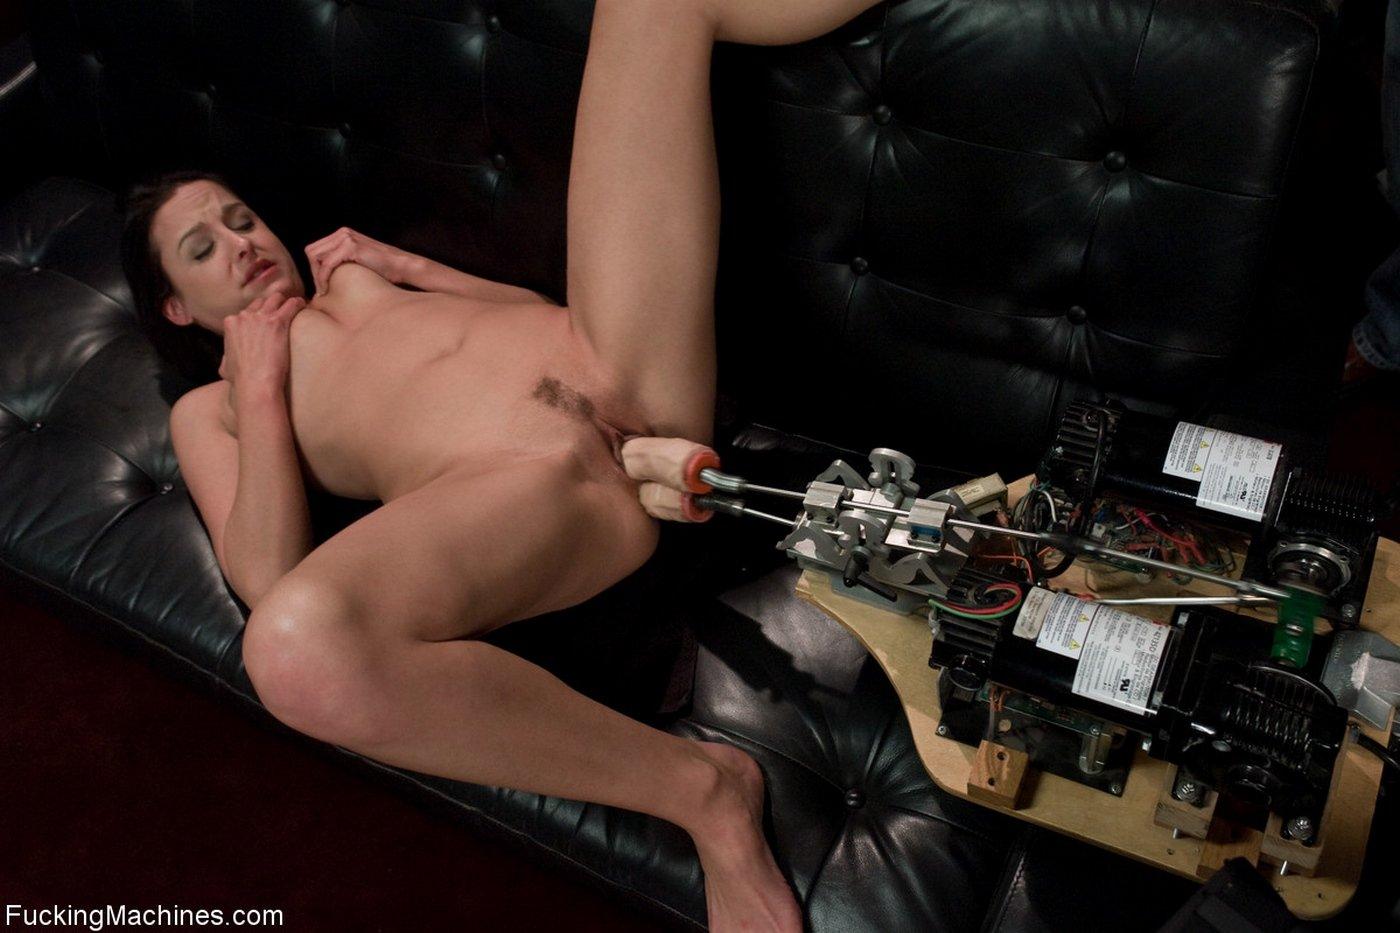 каким секс машина с двумя дырками пока